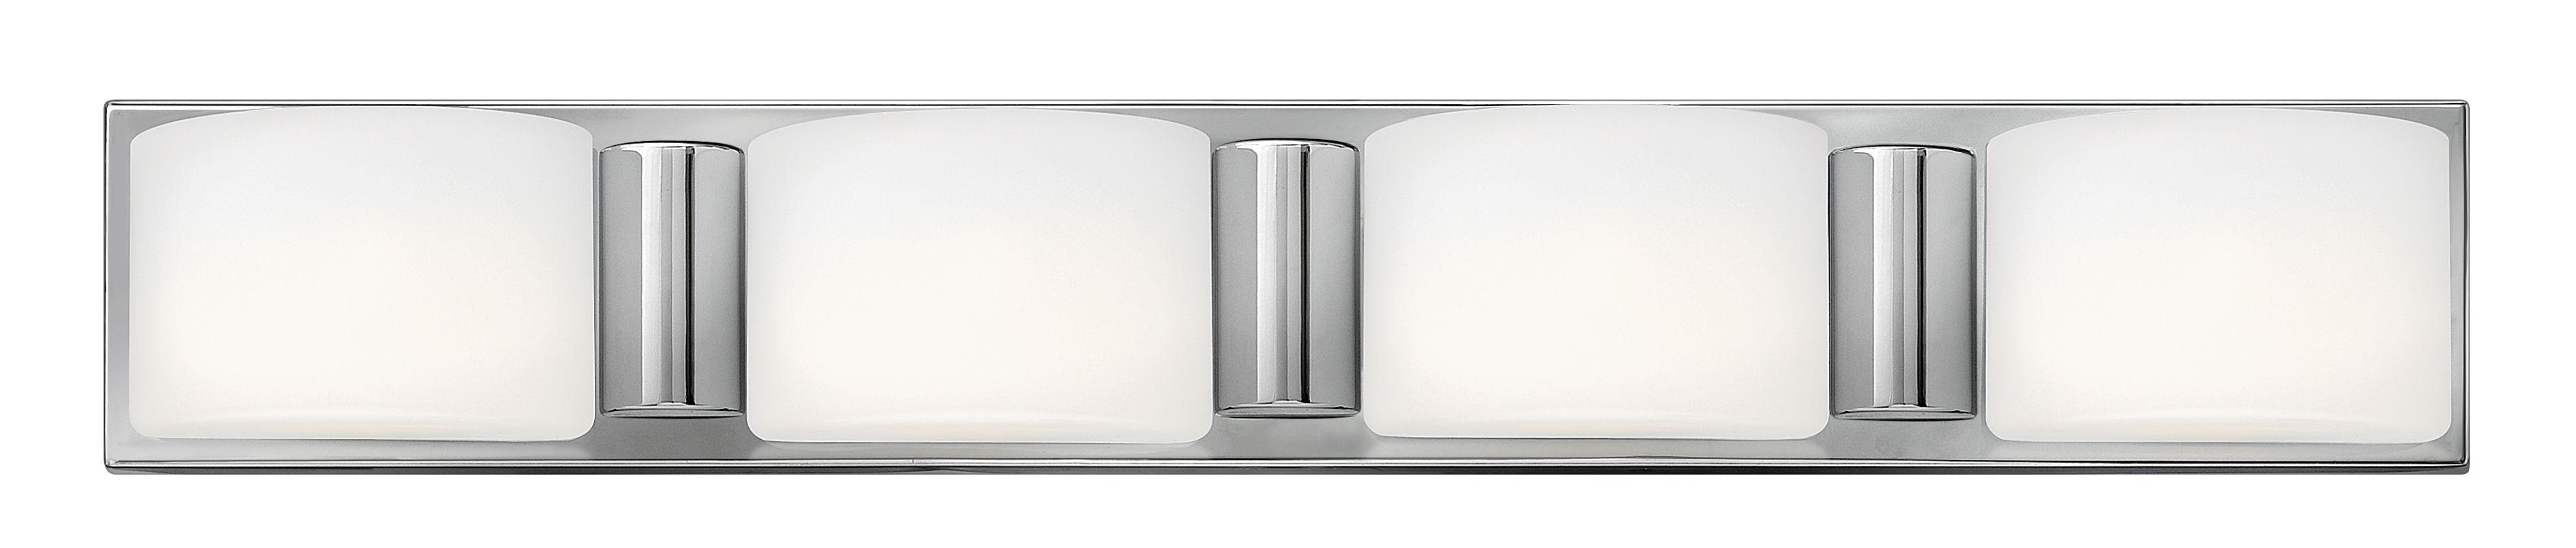 Hinkley Lighting 55484 4 Light Bathroom Vanity Light from the Daria